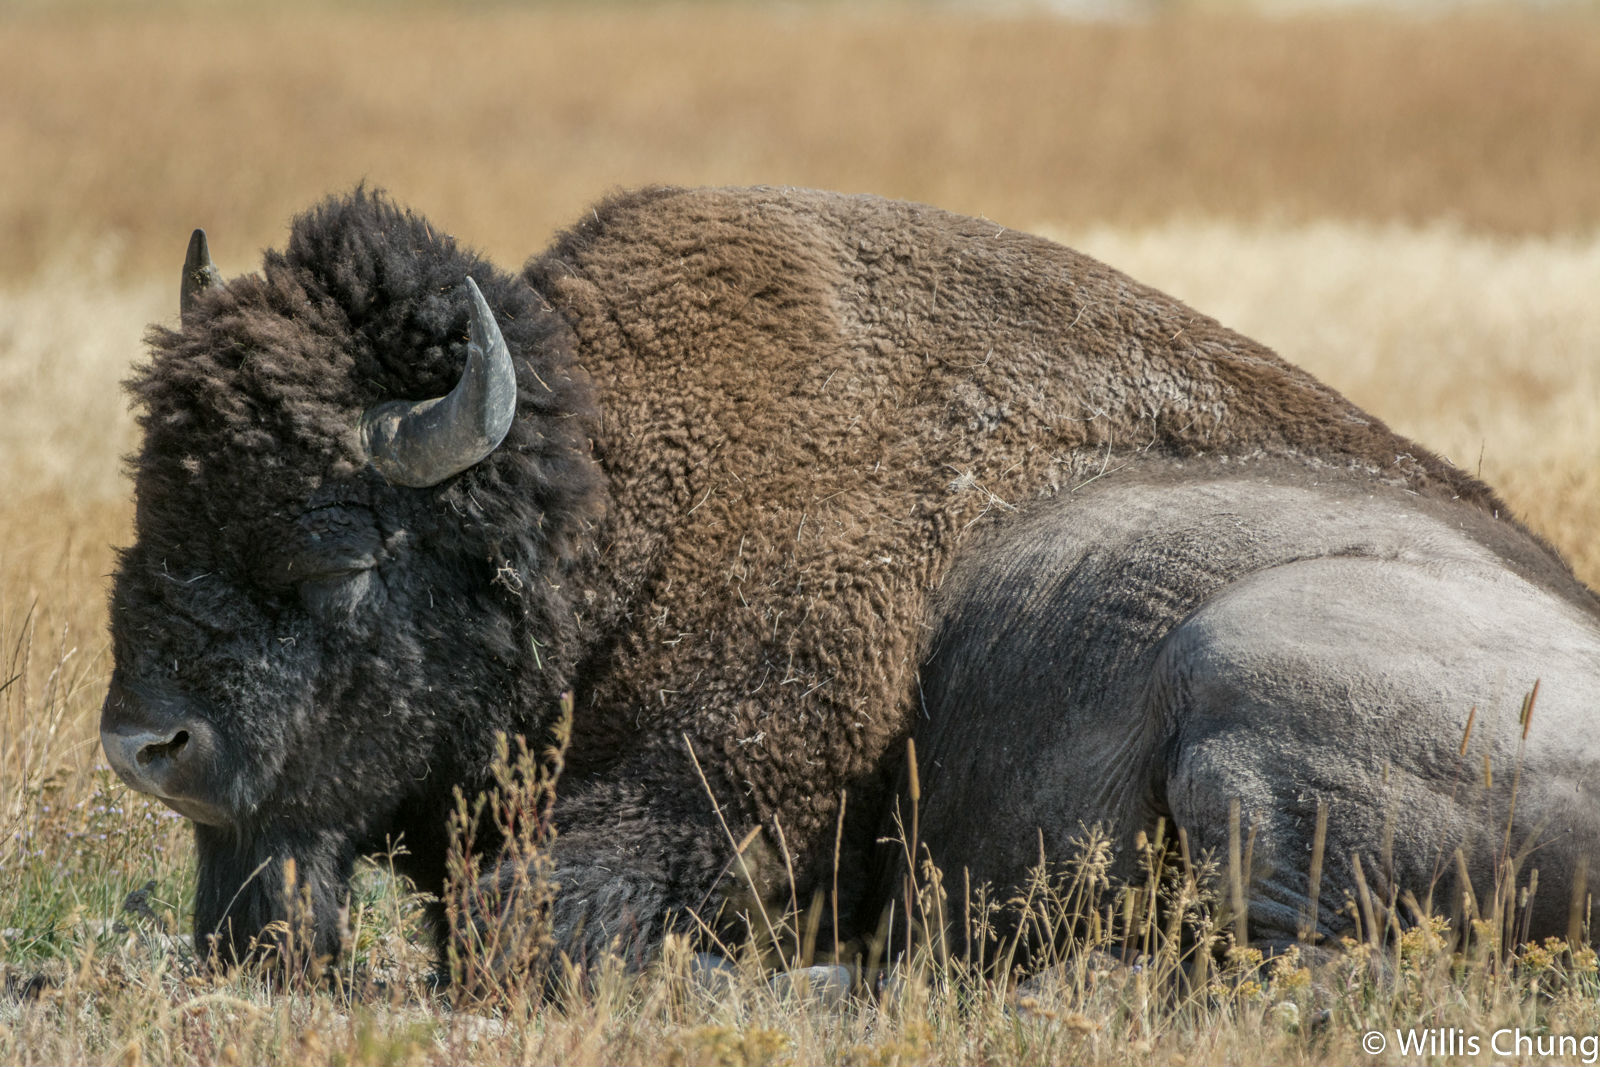 Chung Yellowstone Bull 1 image